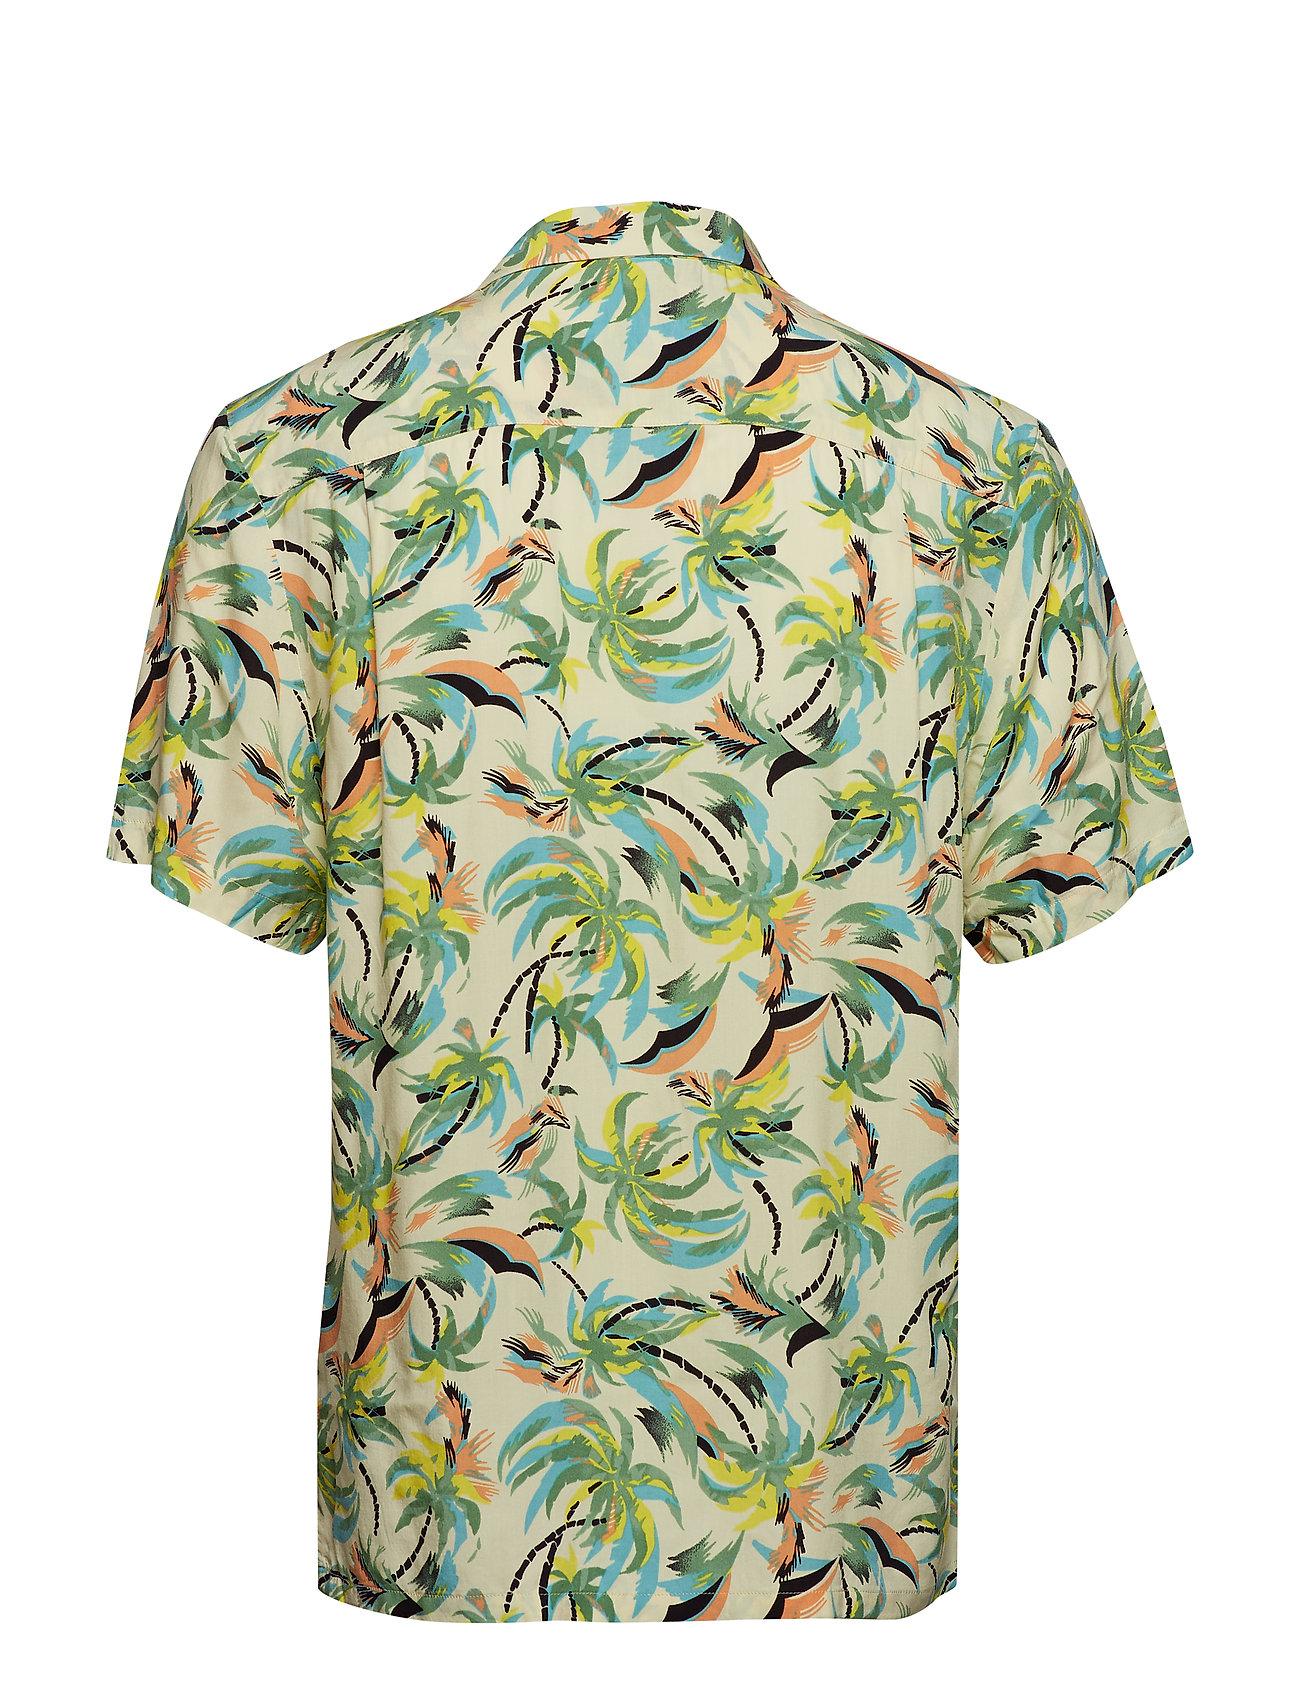 Shirtcombo Shortsleeve Hawaiian BScotchamp; Soda FitPrinted rCoEQWdxBe